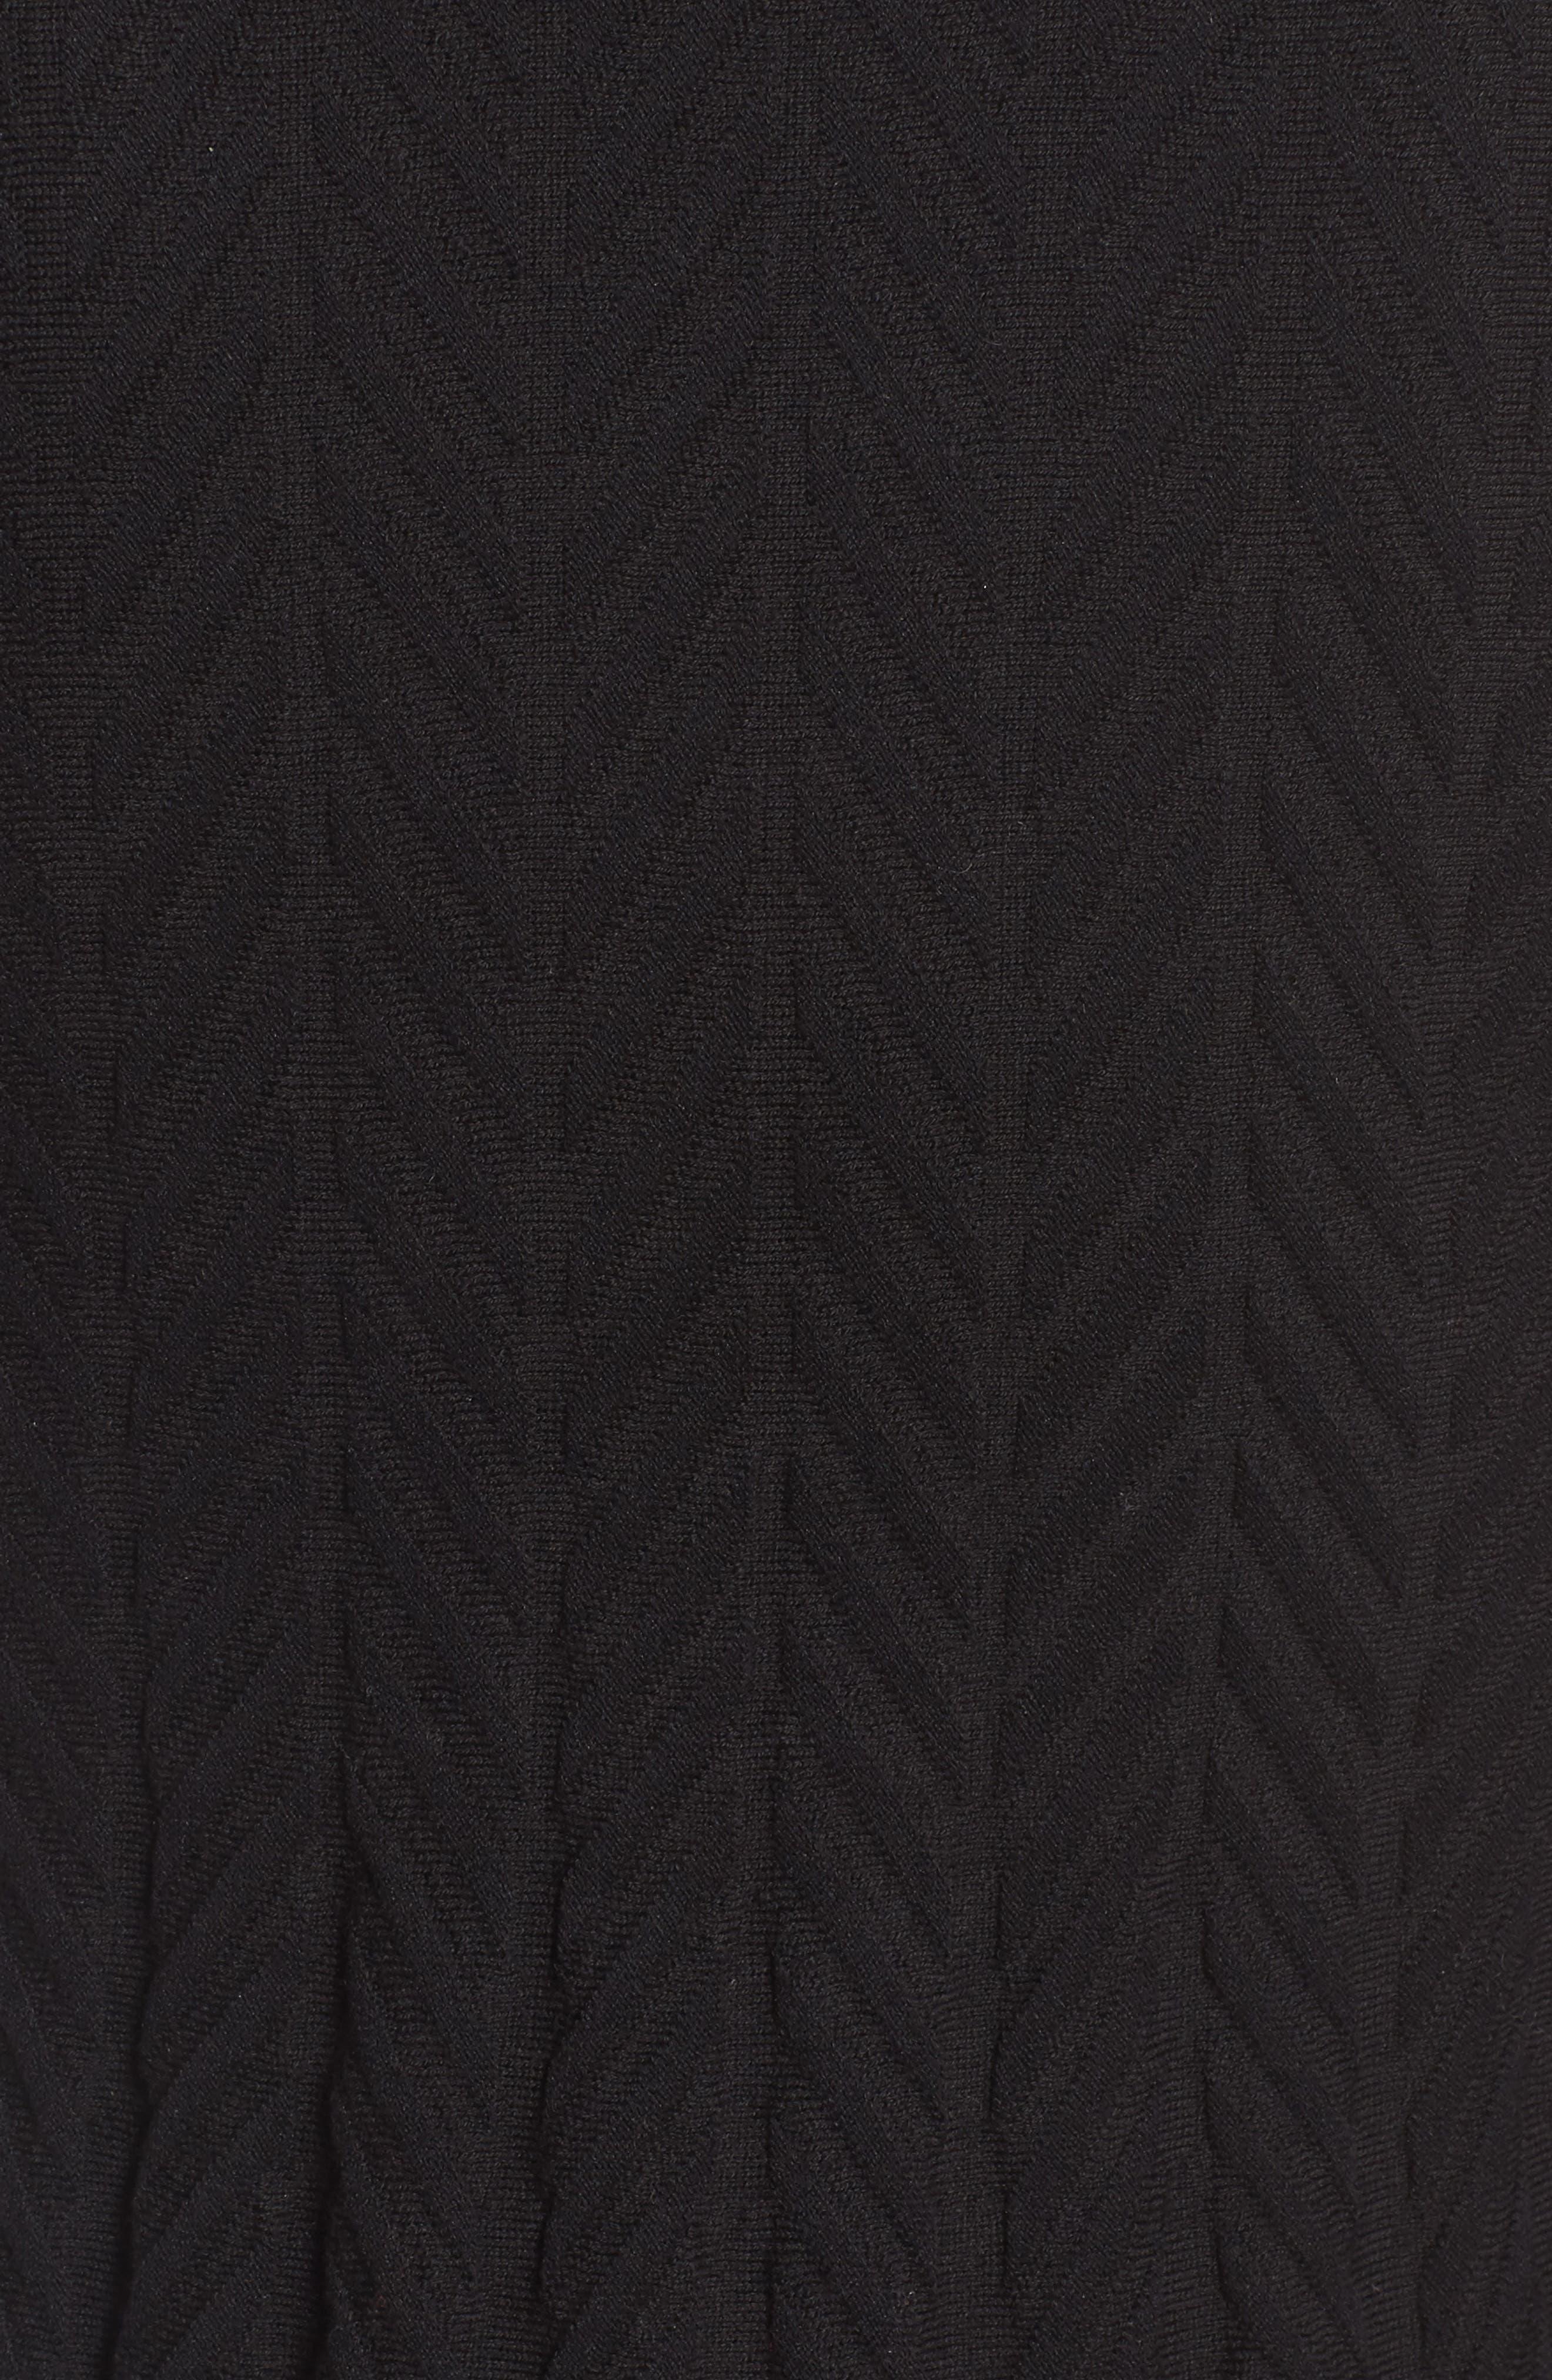 Chevron Stitch Sweater,                             Alternate thumbnail 5, color,                             010